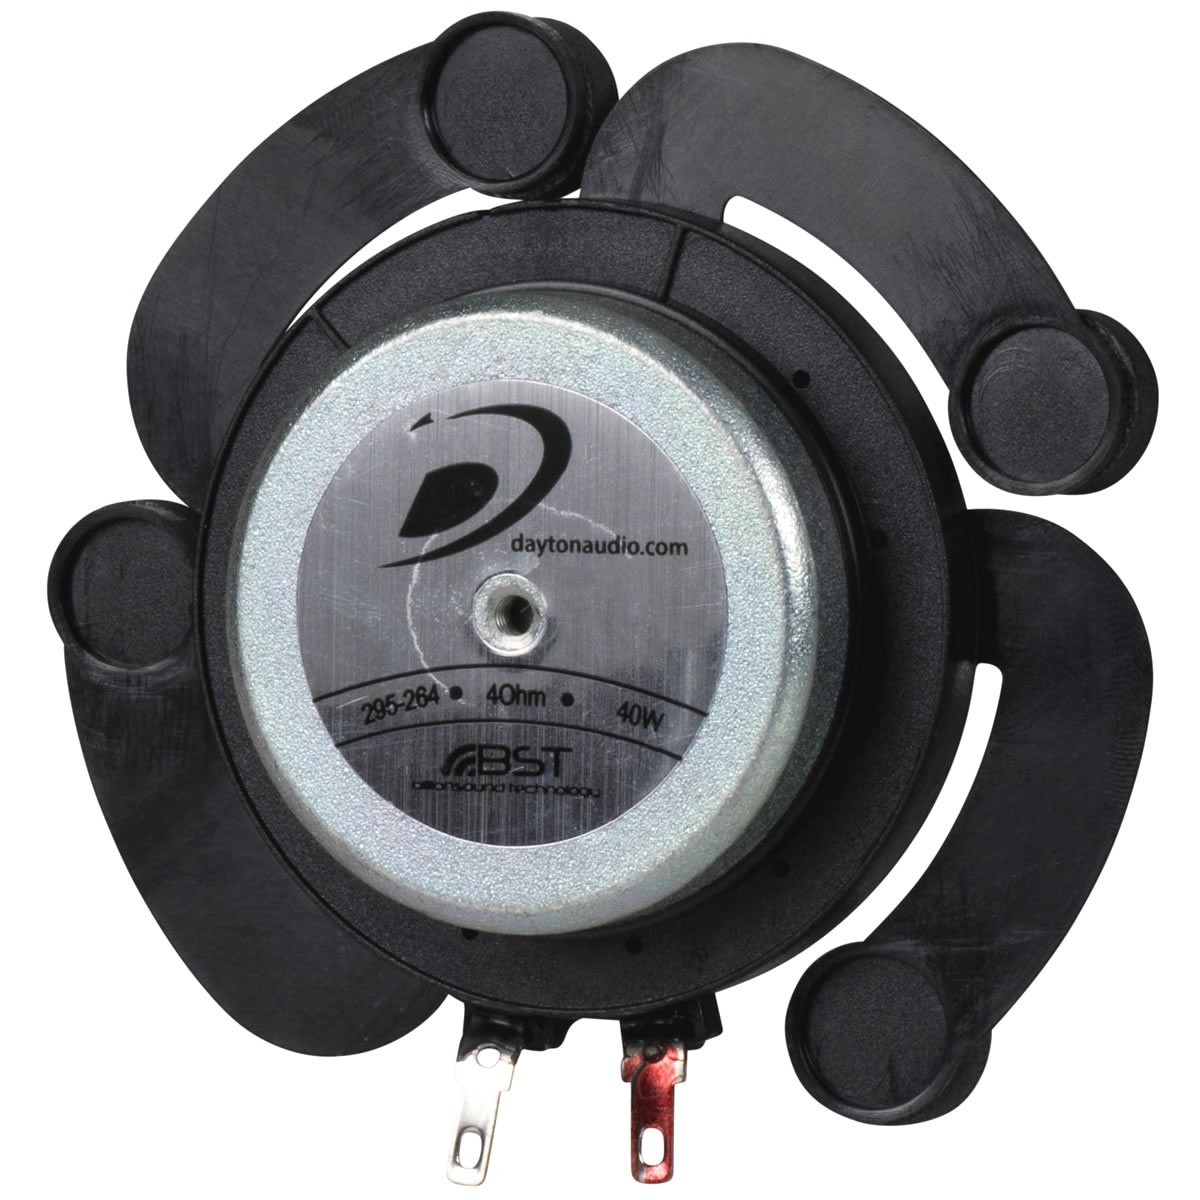 DAYTON AUDIO DAEX32QMB-4 Speaker Driver Quad Exciter Bodyshaker Mega Bass 40W 4 Ohm Ø 3.2cm